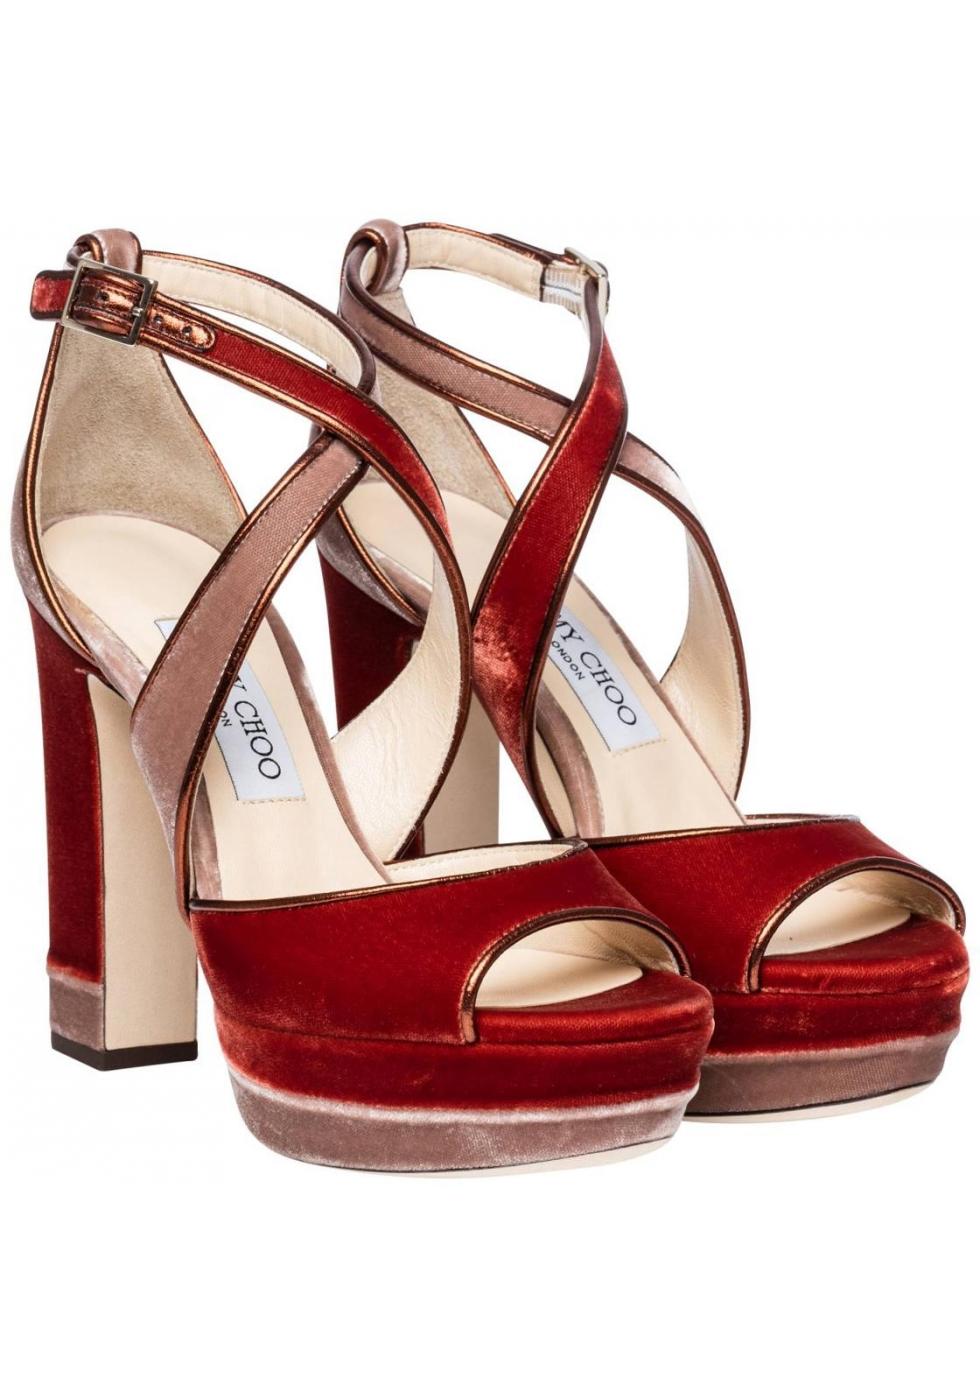 Jimmy Choo Heeled Sandals With Platform In Orange Velvet Italian Boutique